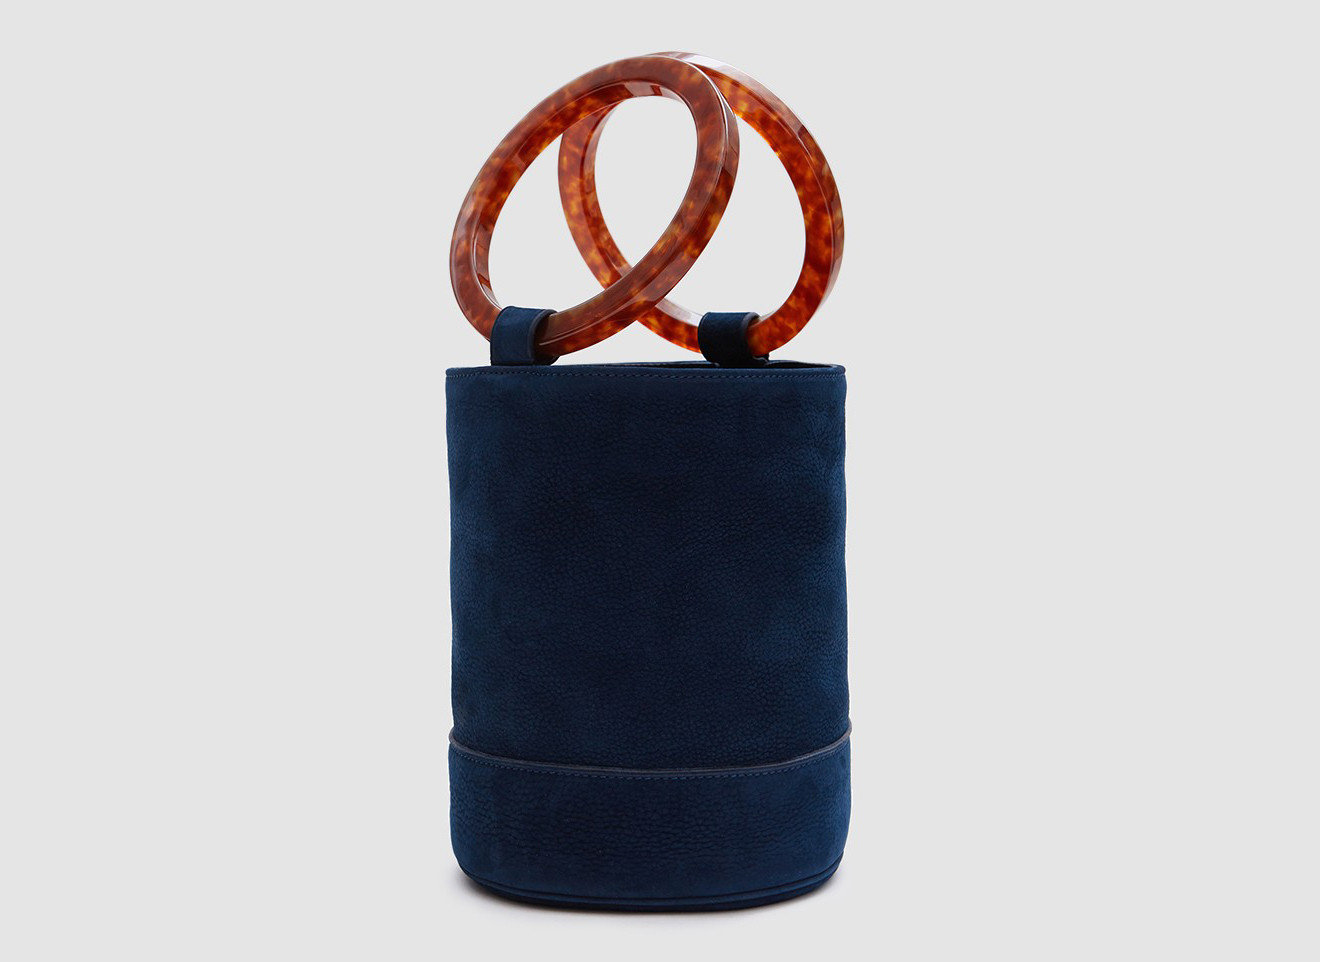 Style + Design Travel Shop cobalt blue electric blue product product design bag accessory